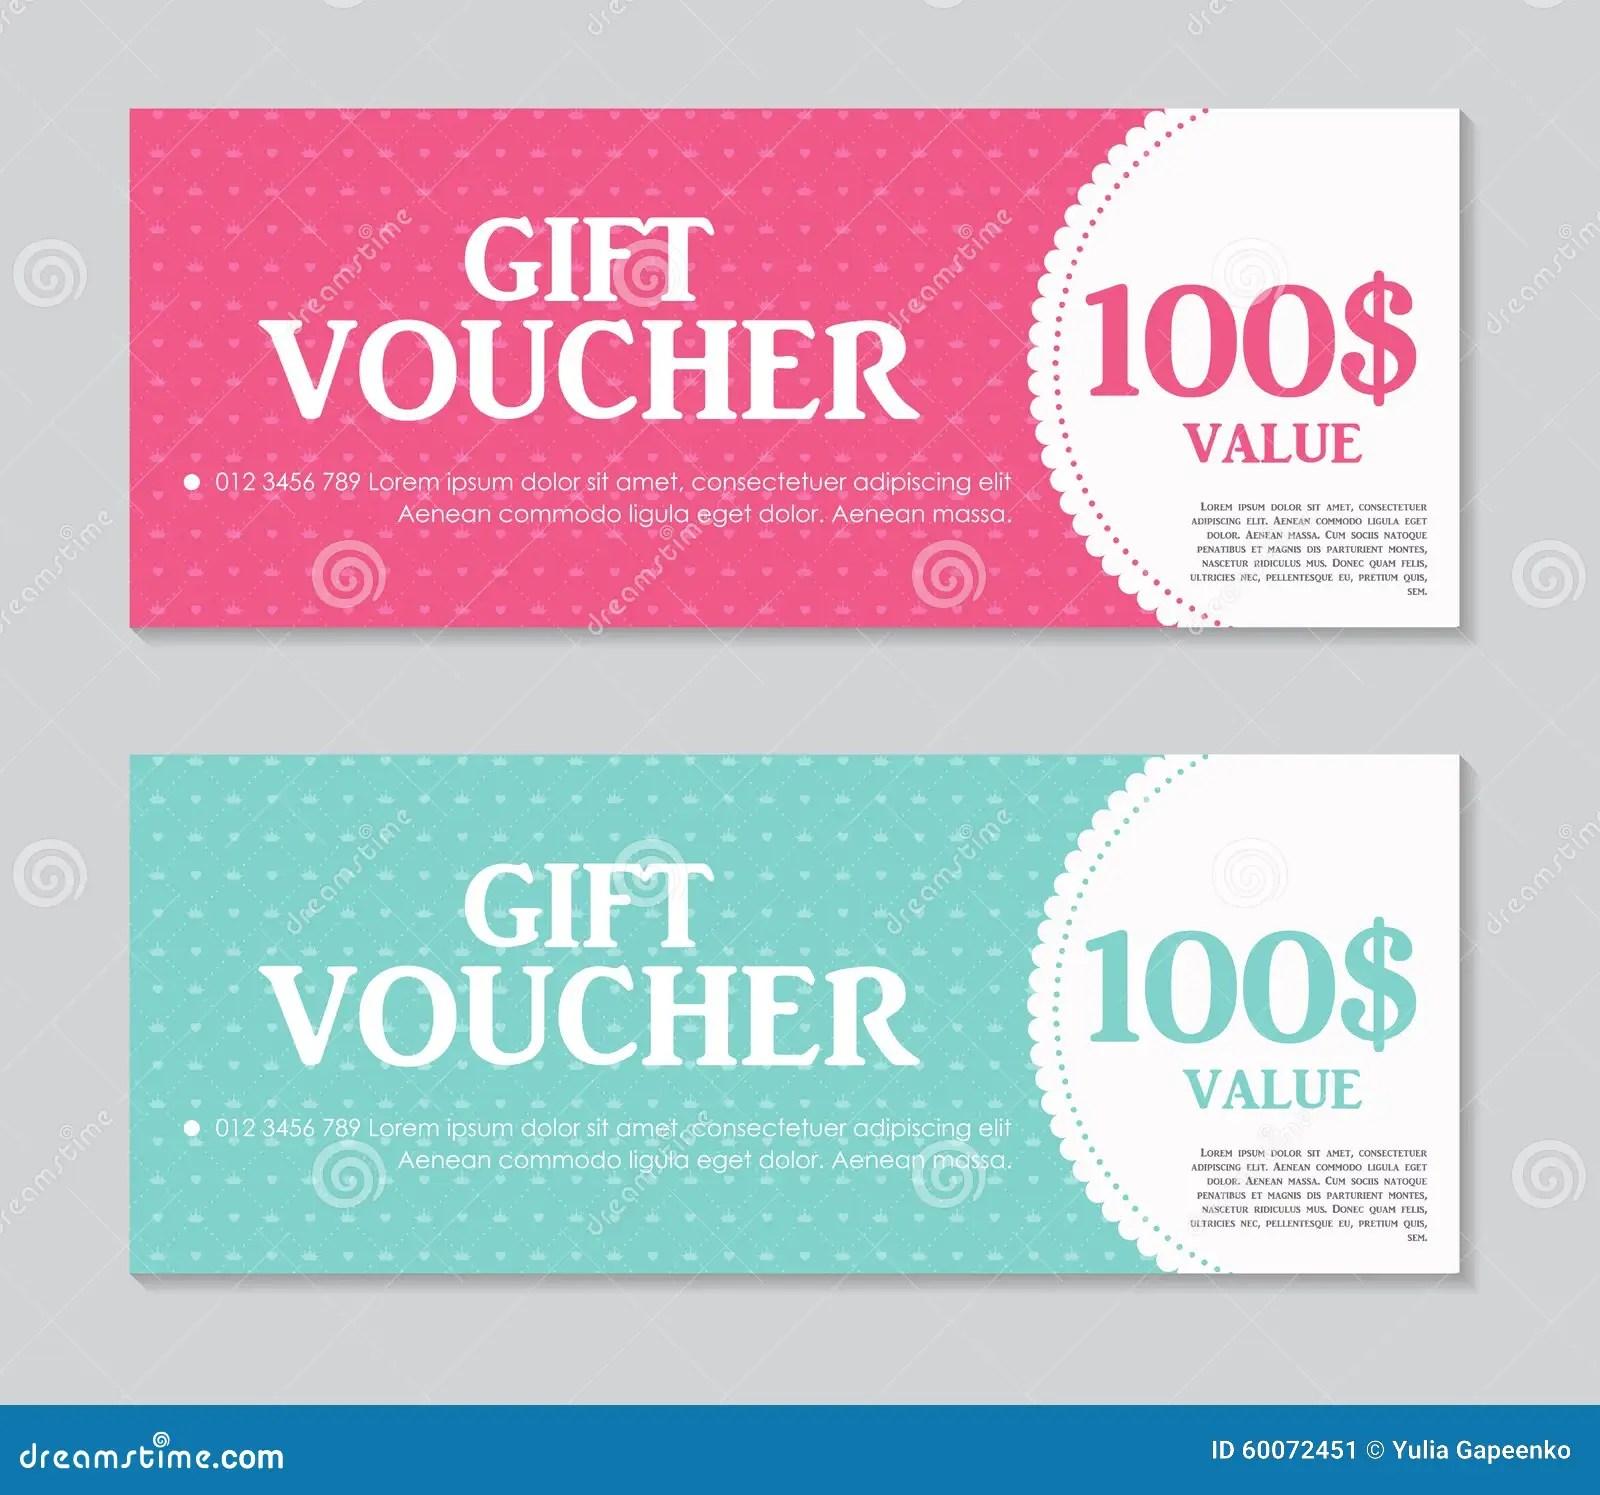 samples of vouchers – Voucher Sample Design